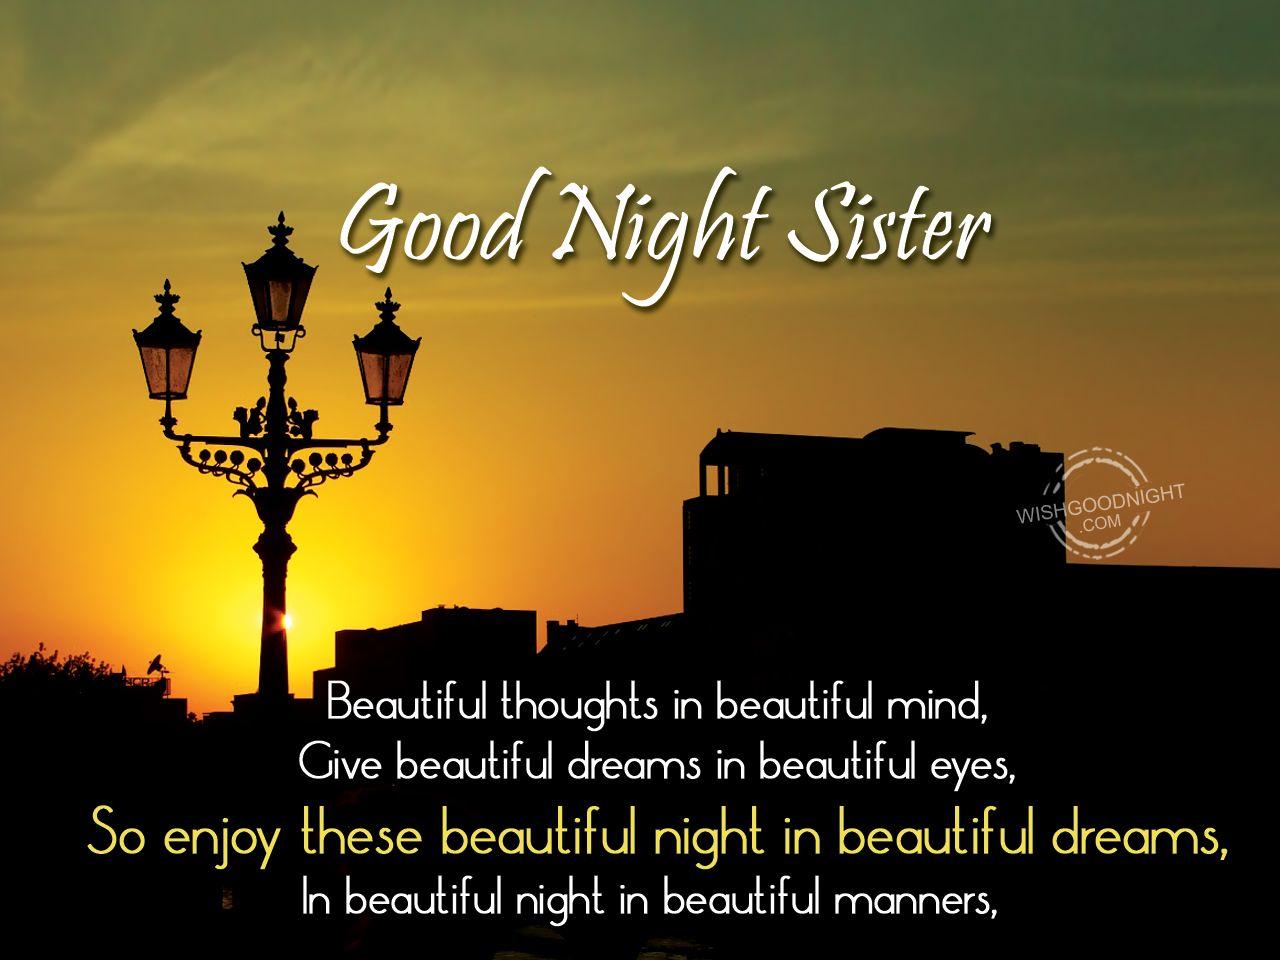 Good Night Sister Images Good Night Good Night Good Night Image